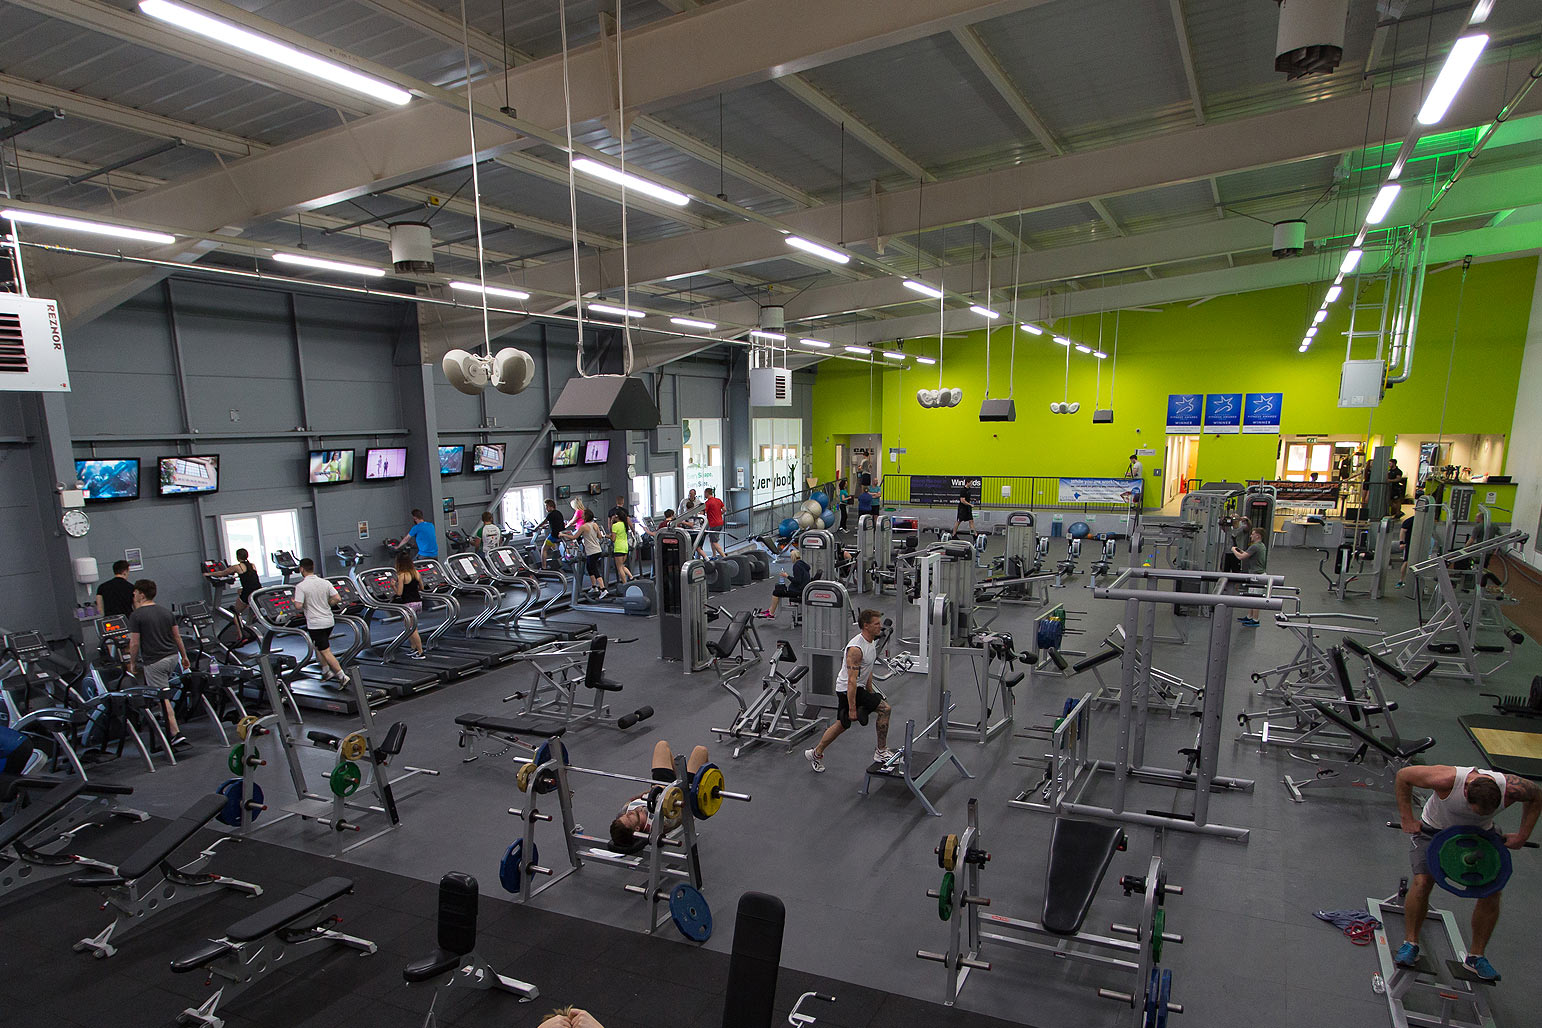 winners-gym-2000-newton-abbot-7.jpg